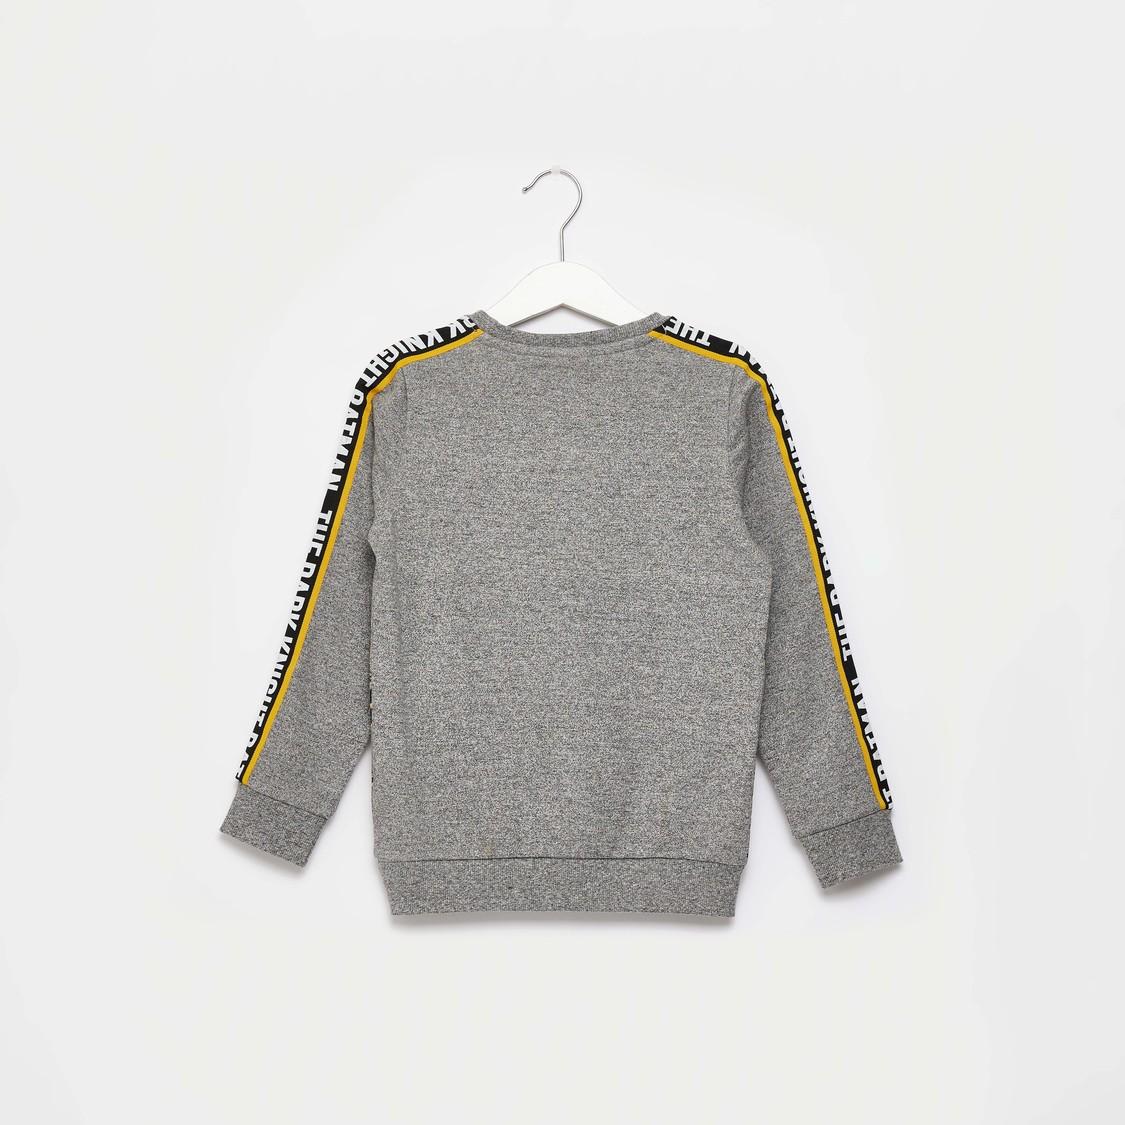 Batman Print Round Neck Sweatshirt with Long Sleeves